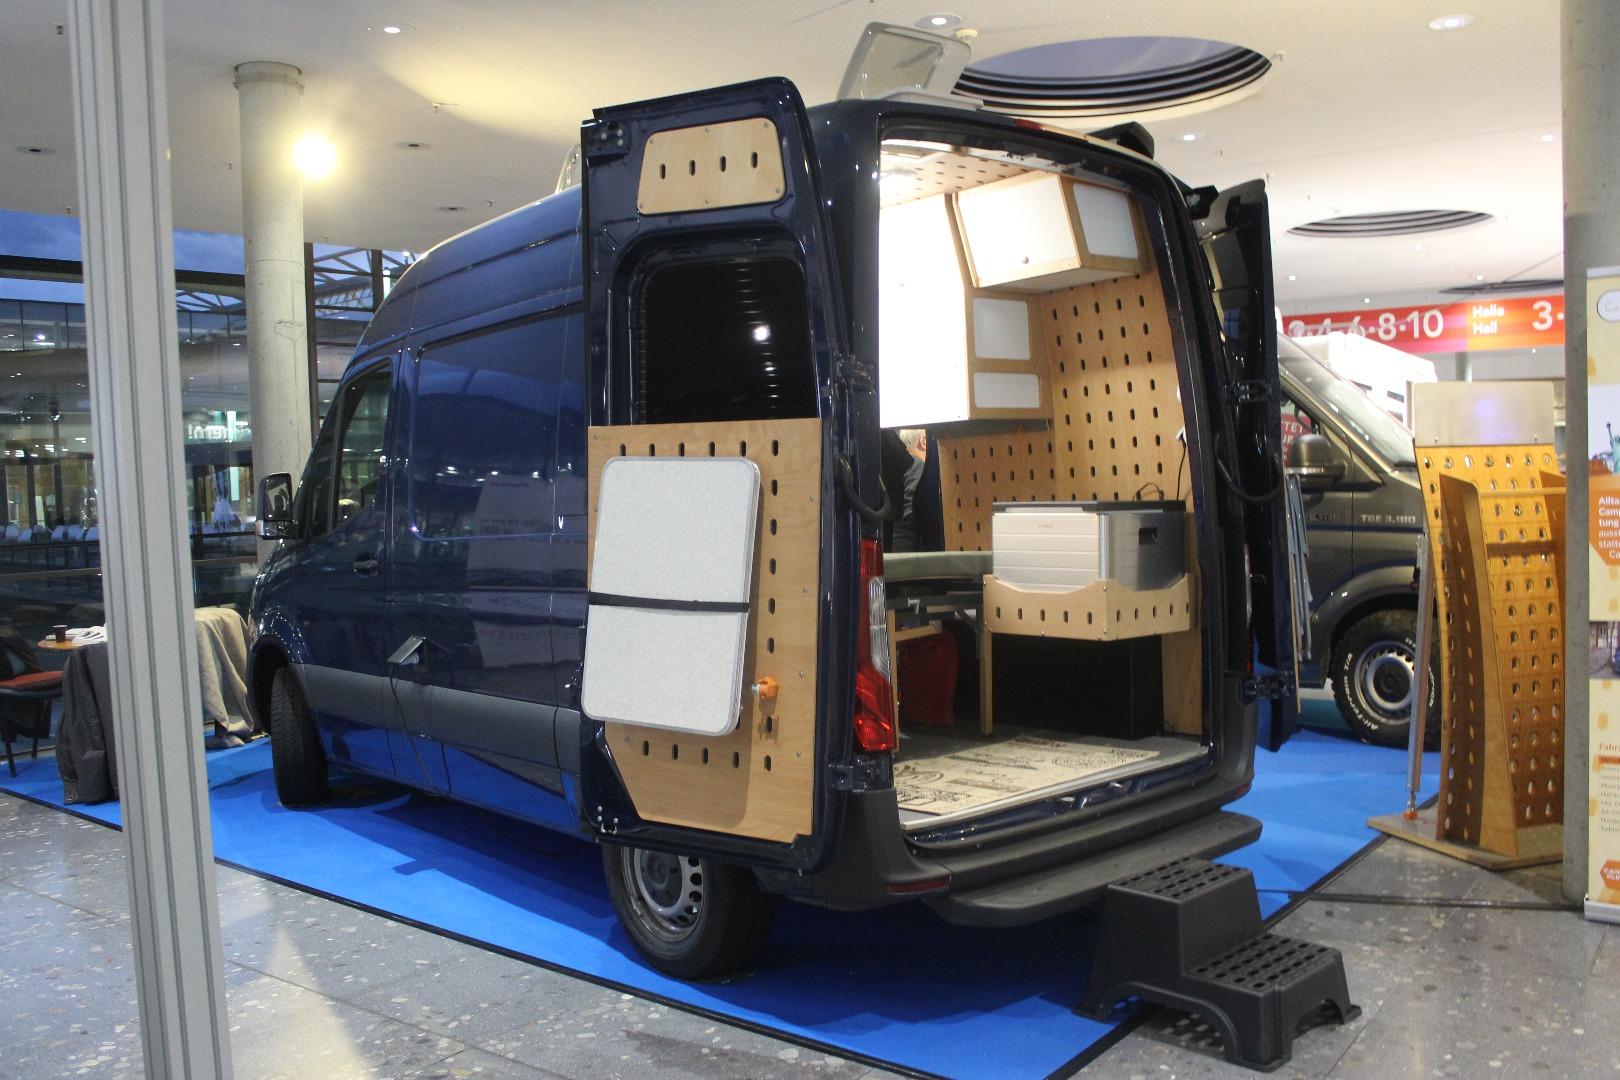 Cargo Camper uses oversized pegboard to create ultra-versatile modular camper vans